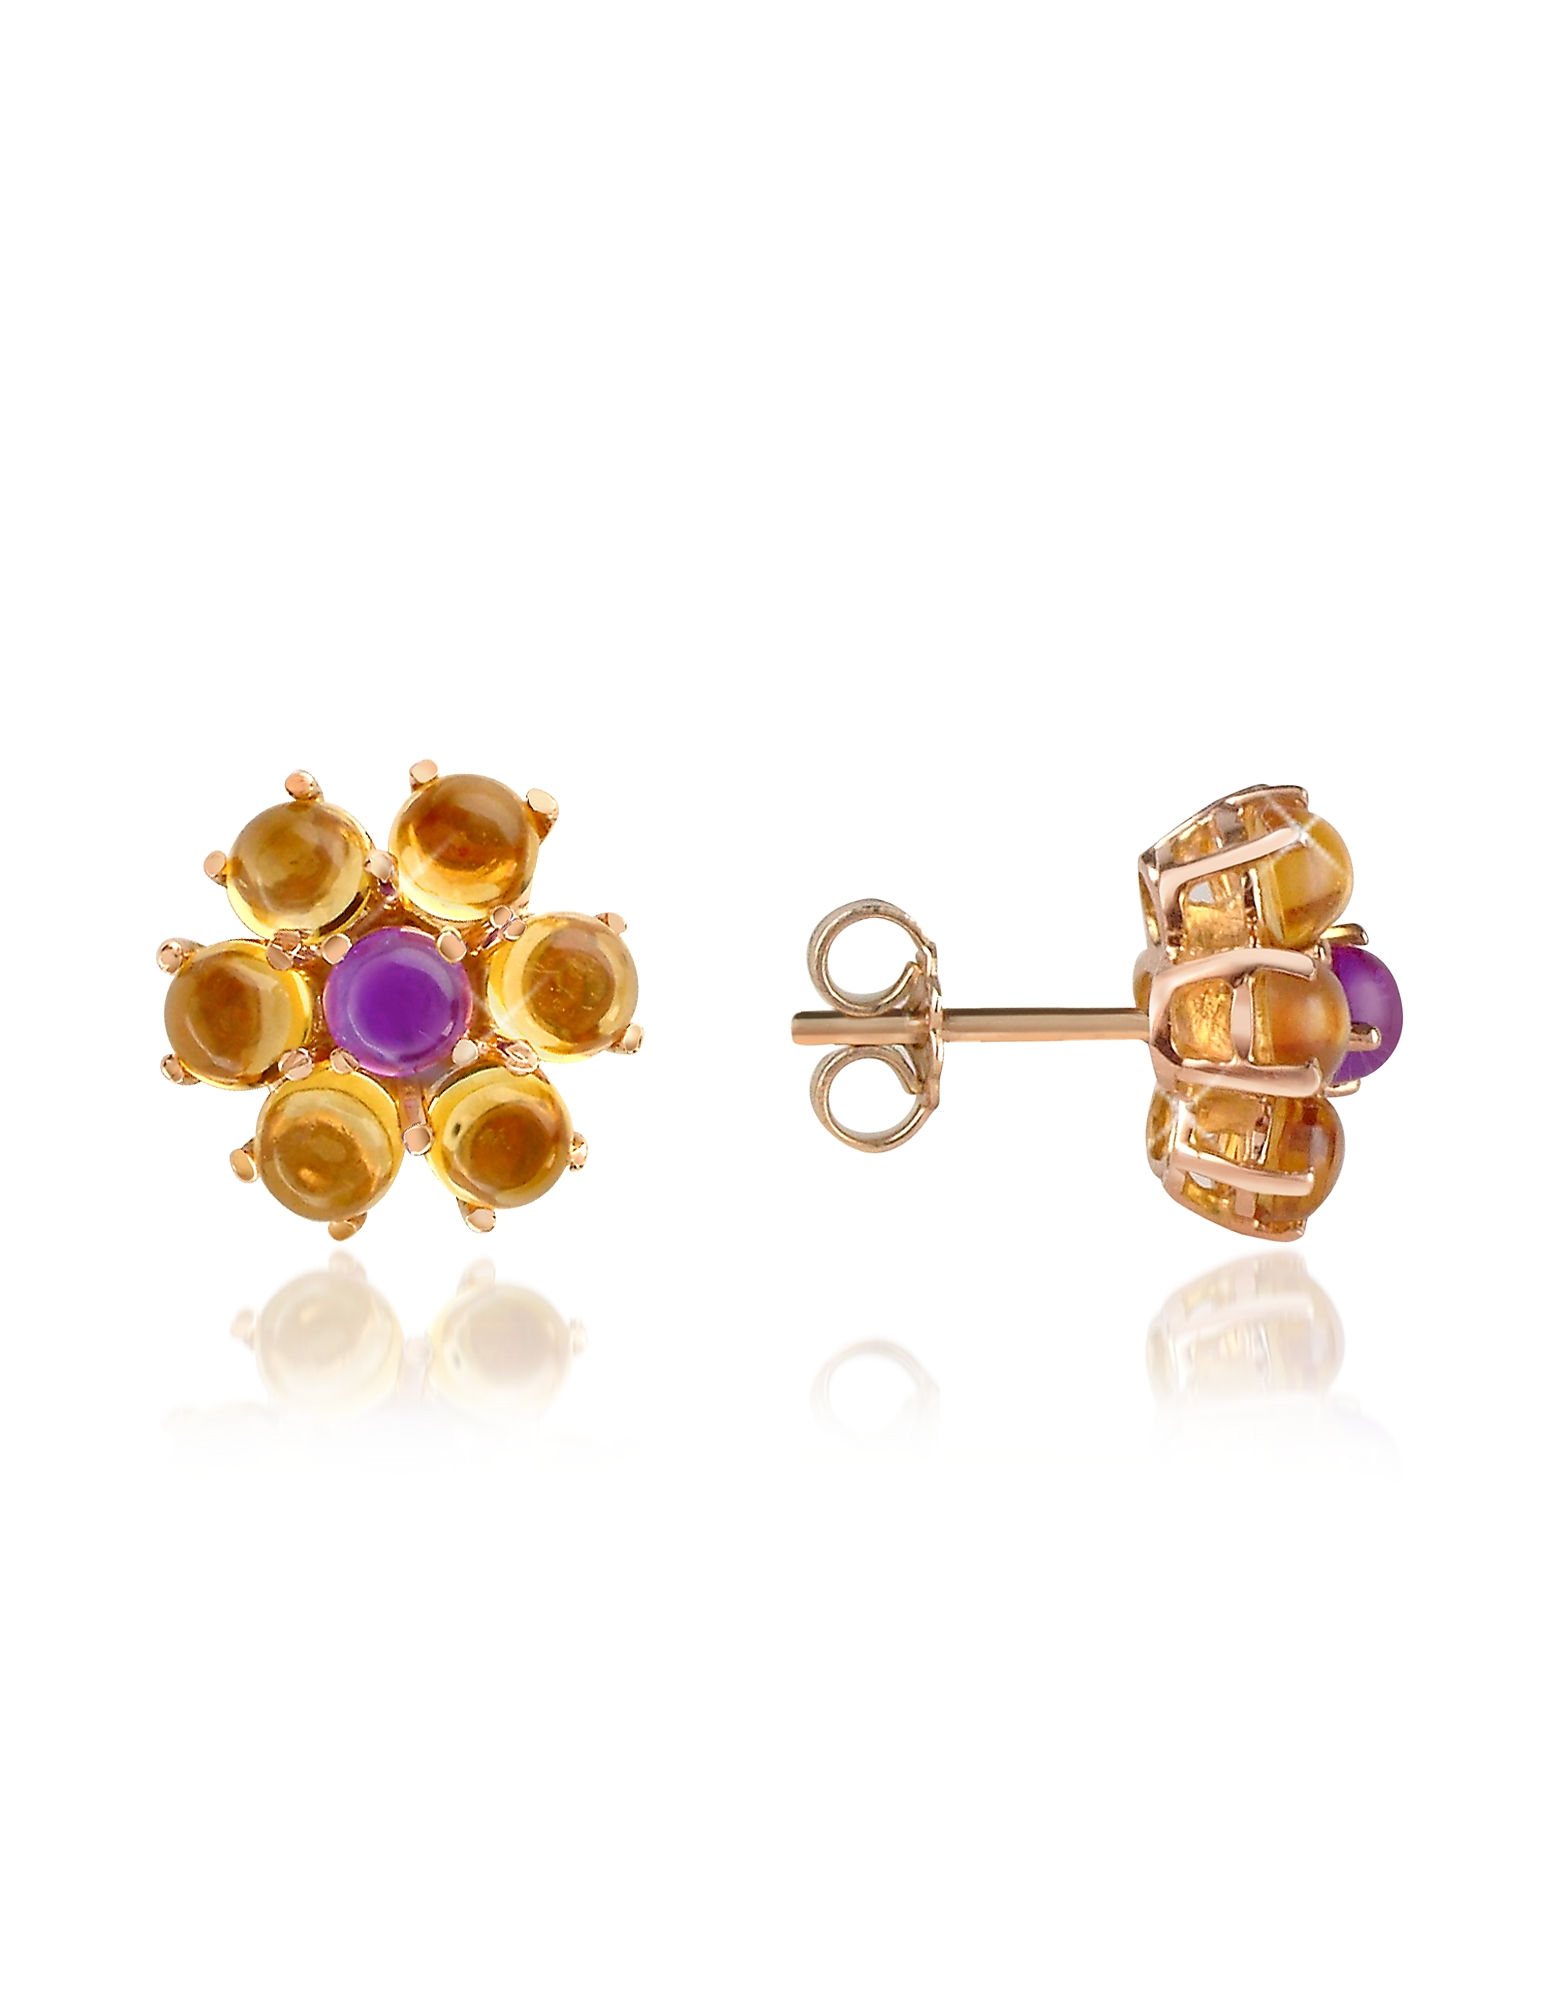 Forzieri Earrings, Amethyst and Citrine Flower 18K Gold Earrings